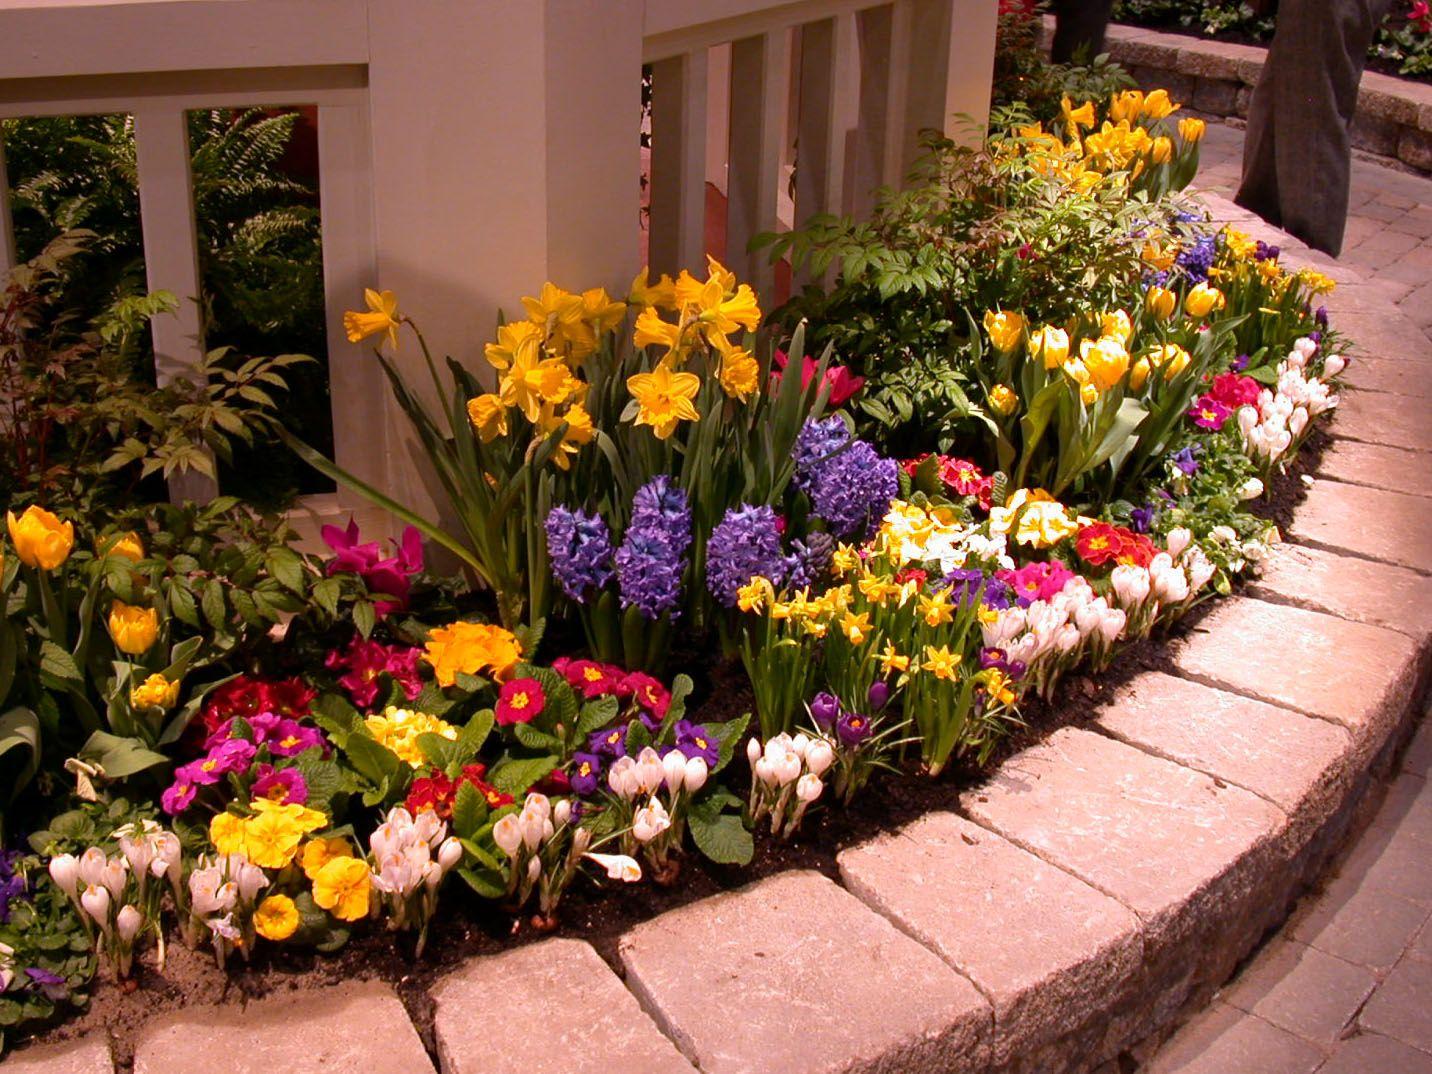 Genial Garden Ideas